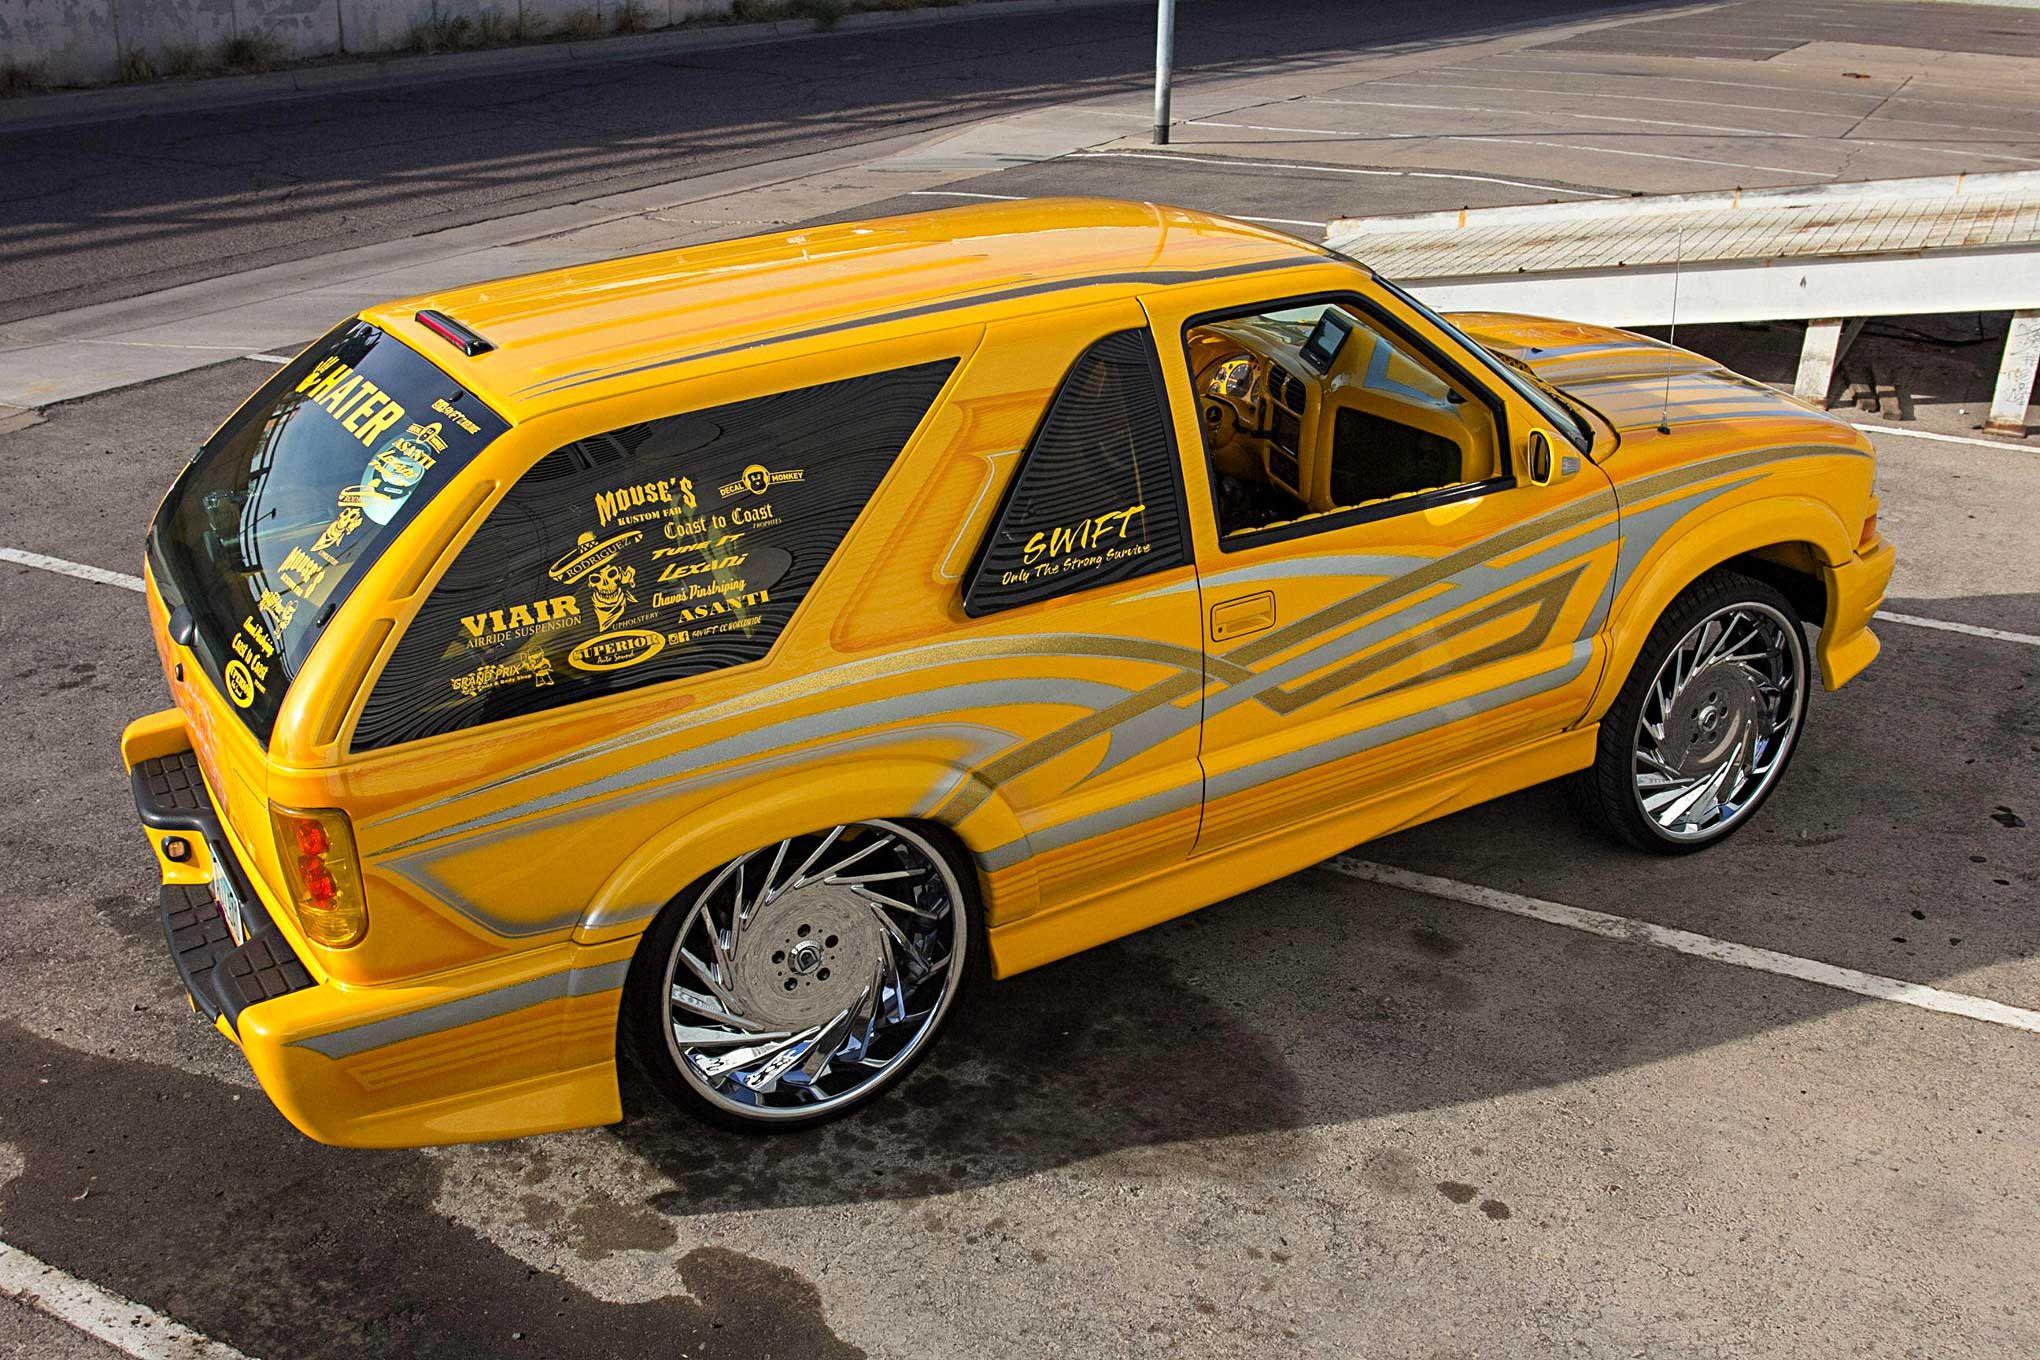 medium resolution of 2003 chevy blazer xtreme an extreme build